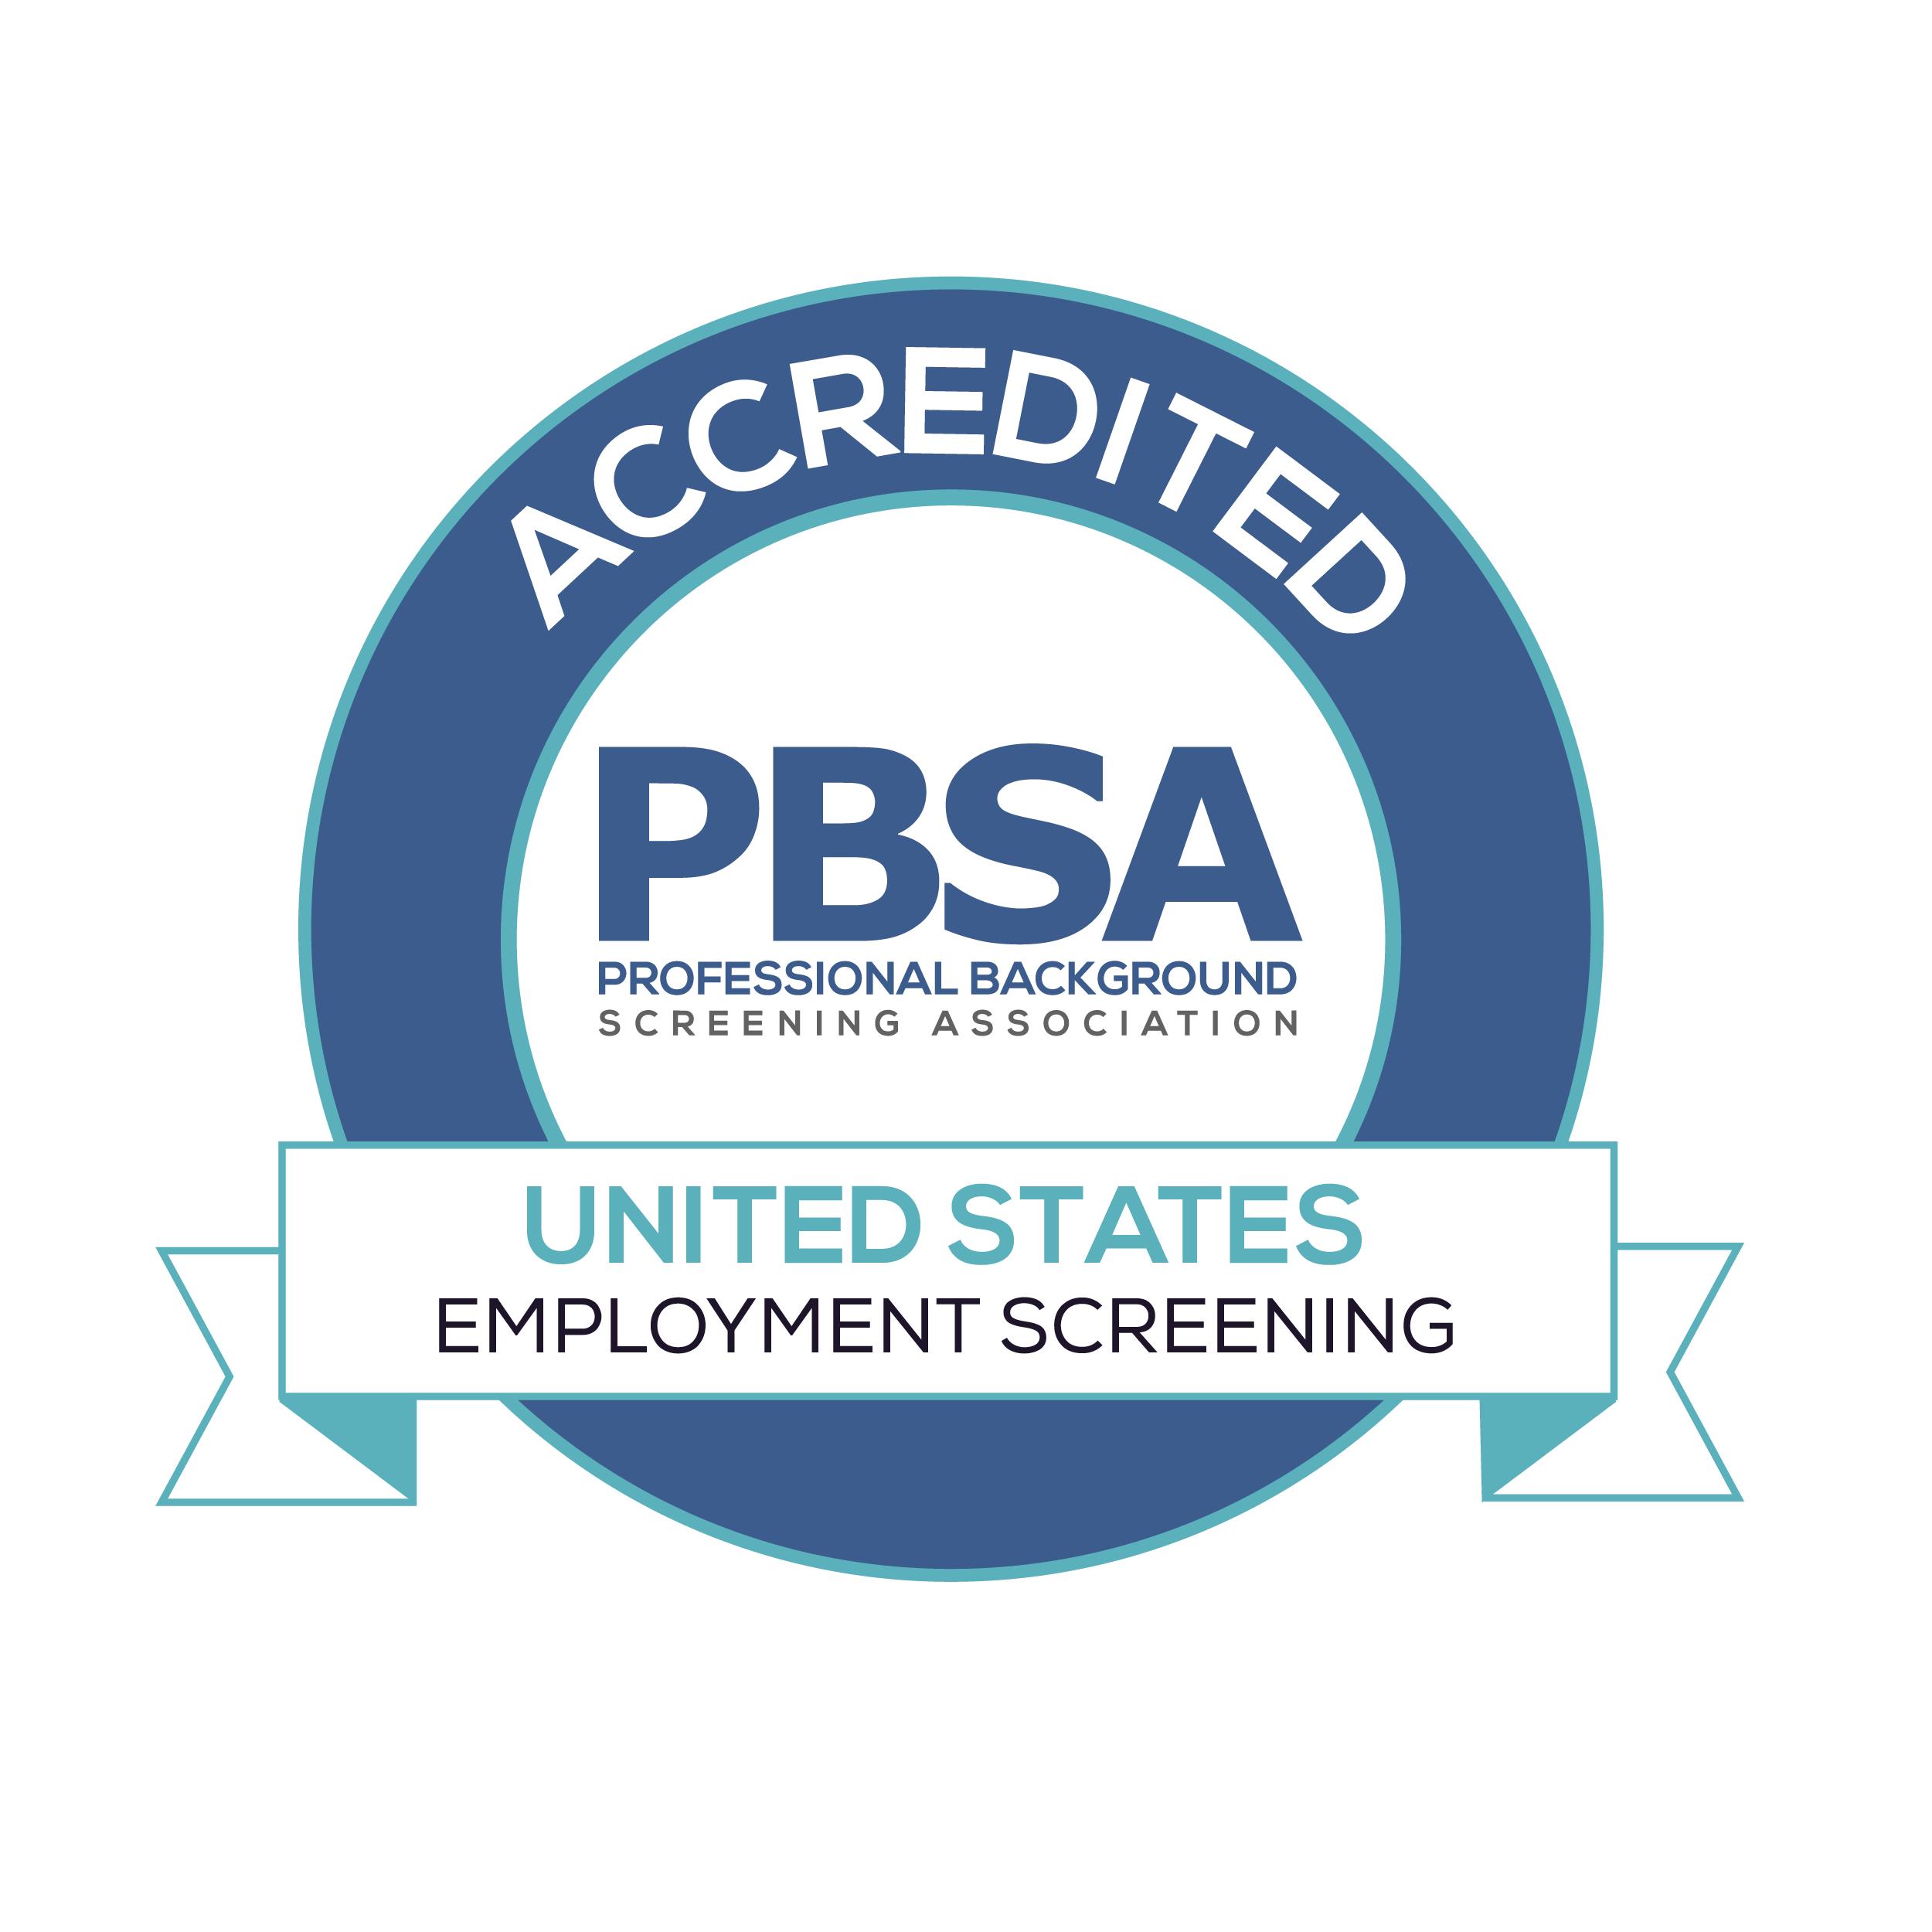 Accreditation WHITE_PBSA